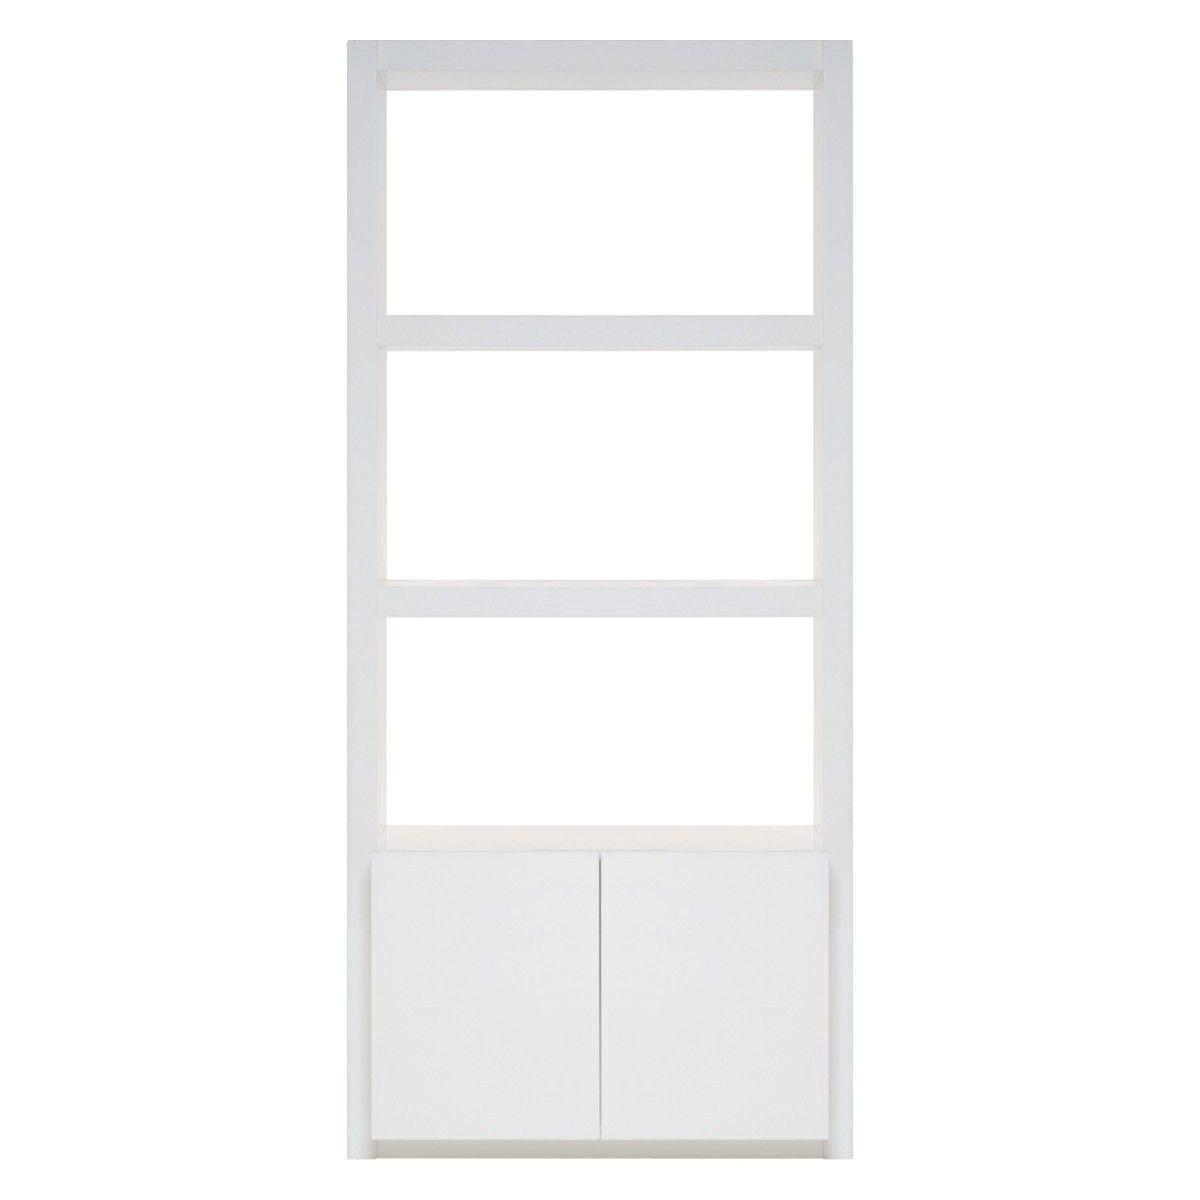 ASPEN White High Gloss Narrow Open Shelving With 2